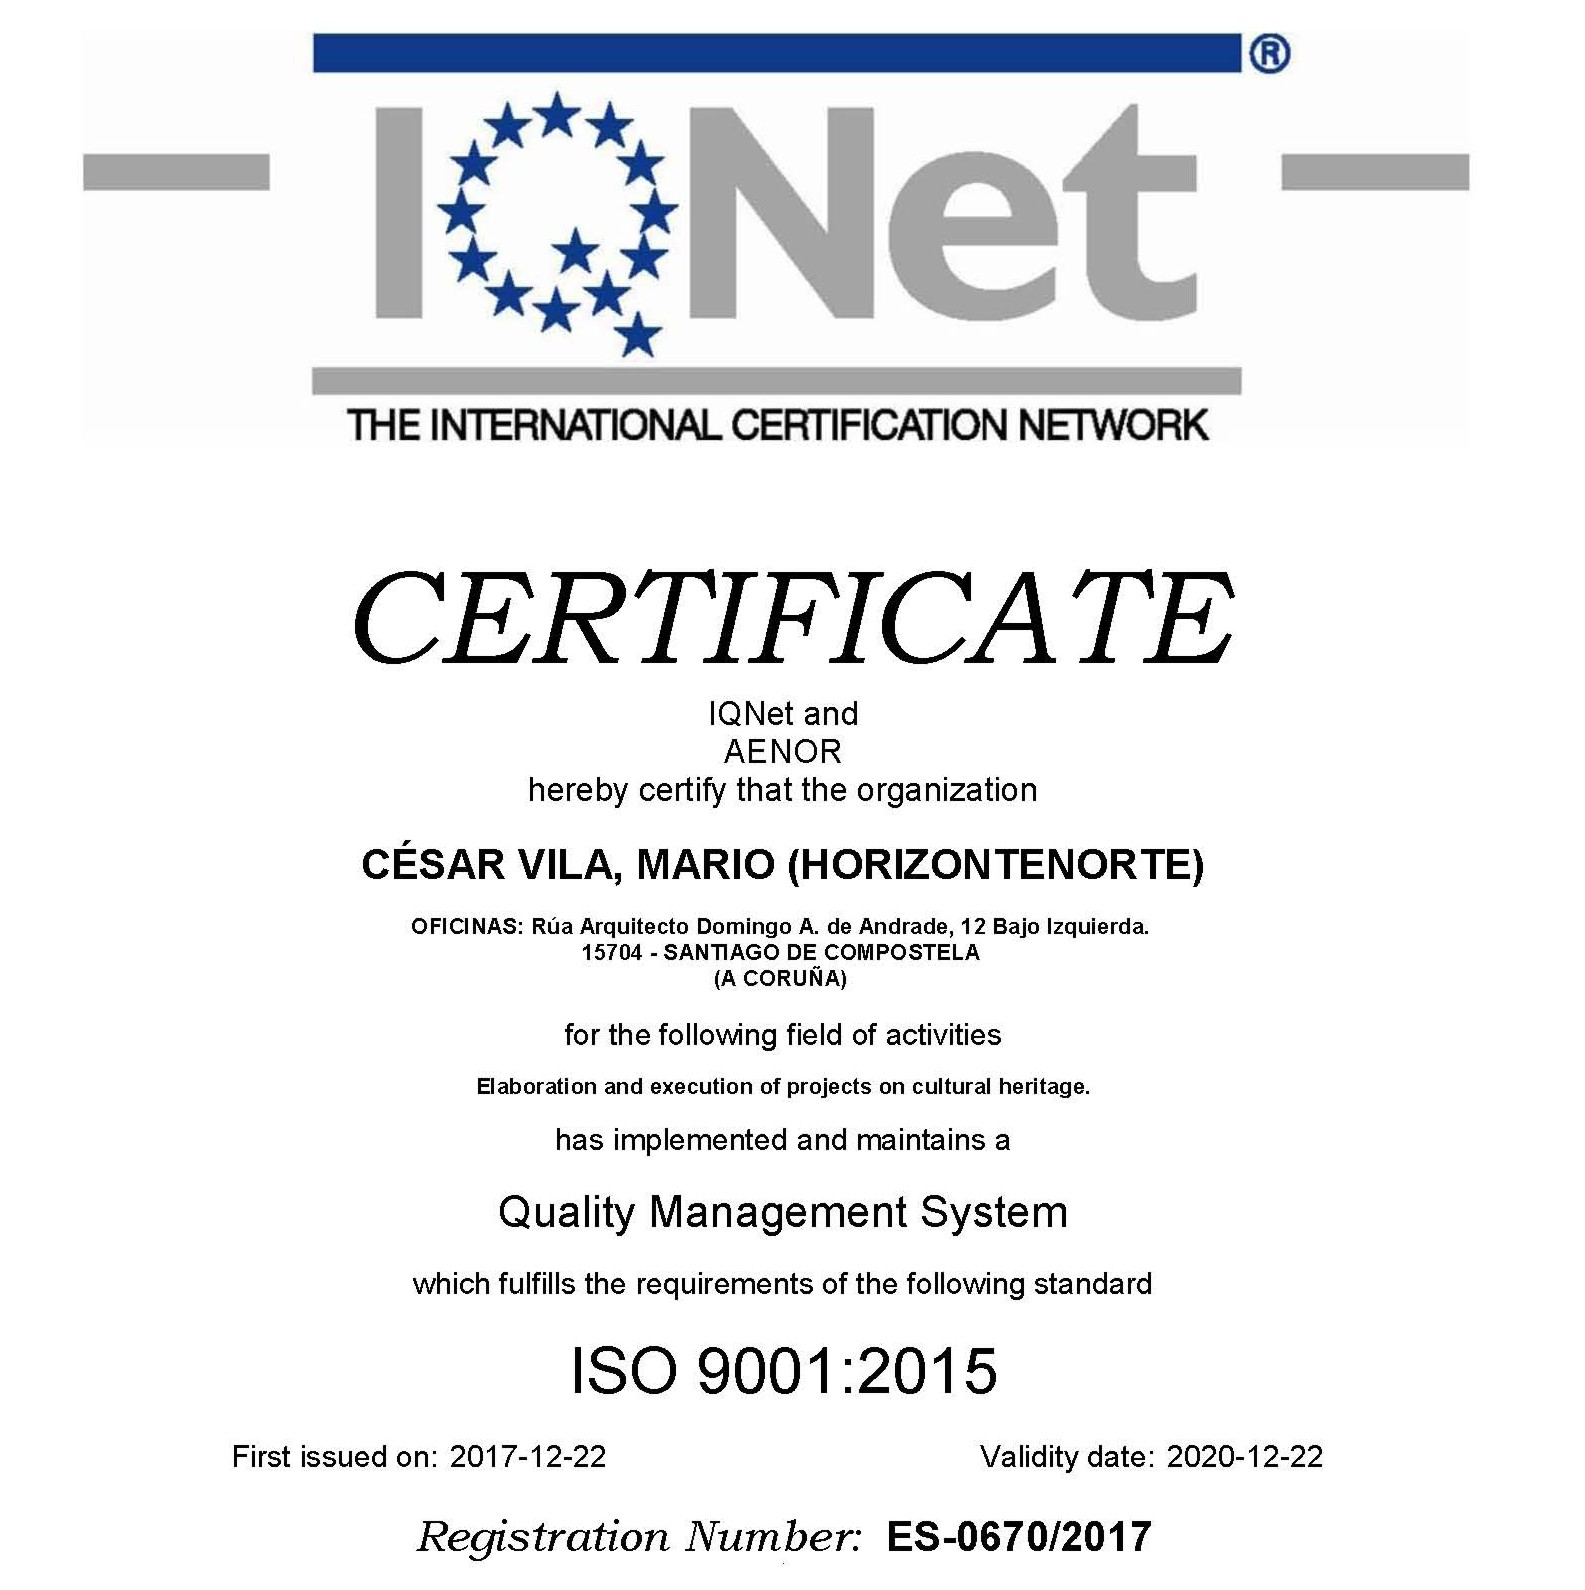 Certificación internacional ISO 9001:2015